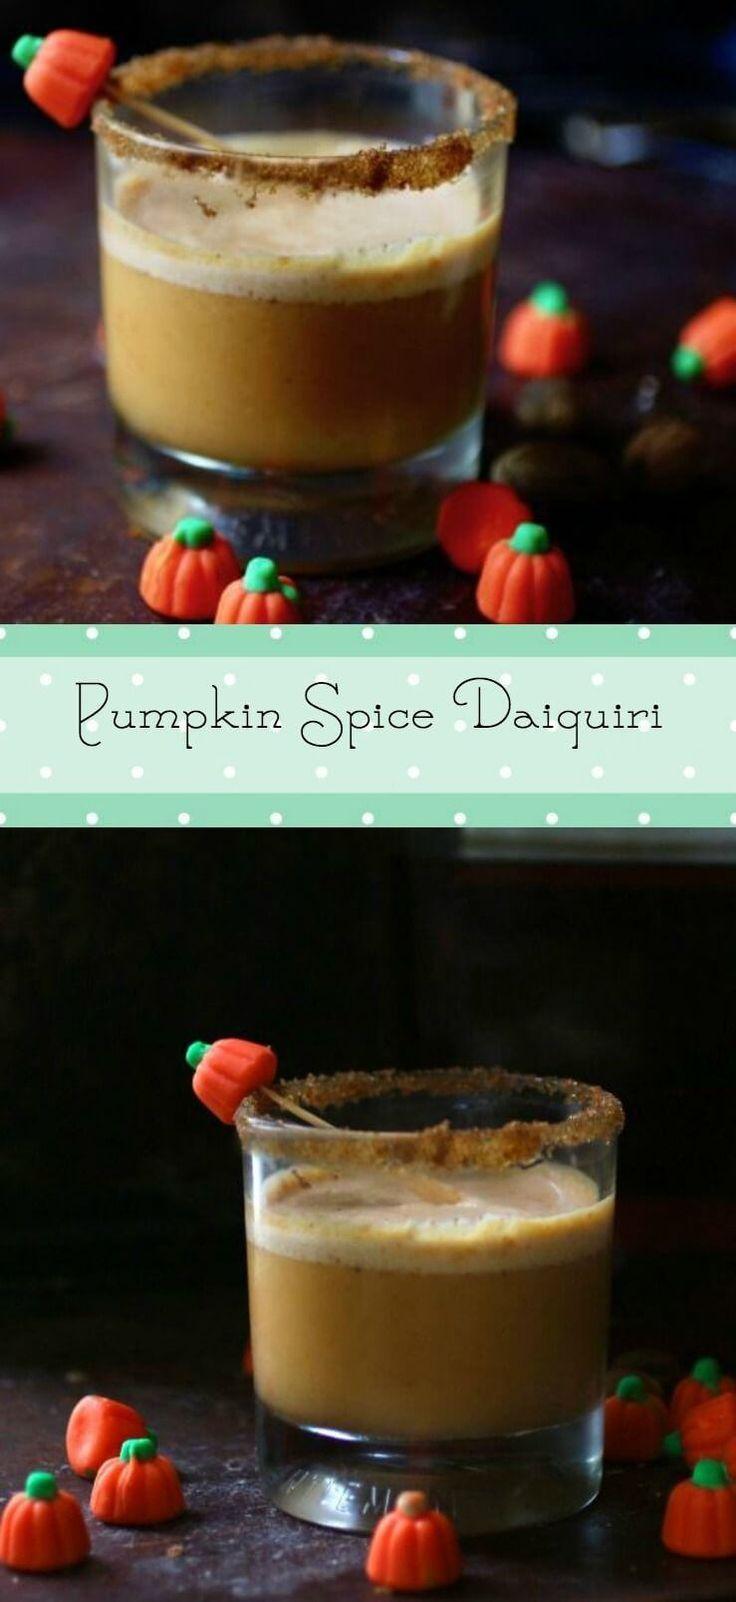 Pumpkin spice daiquiri recipe daiquiri cocktail for Spiced rum drink recipes